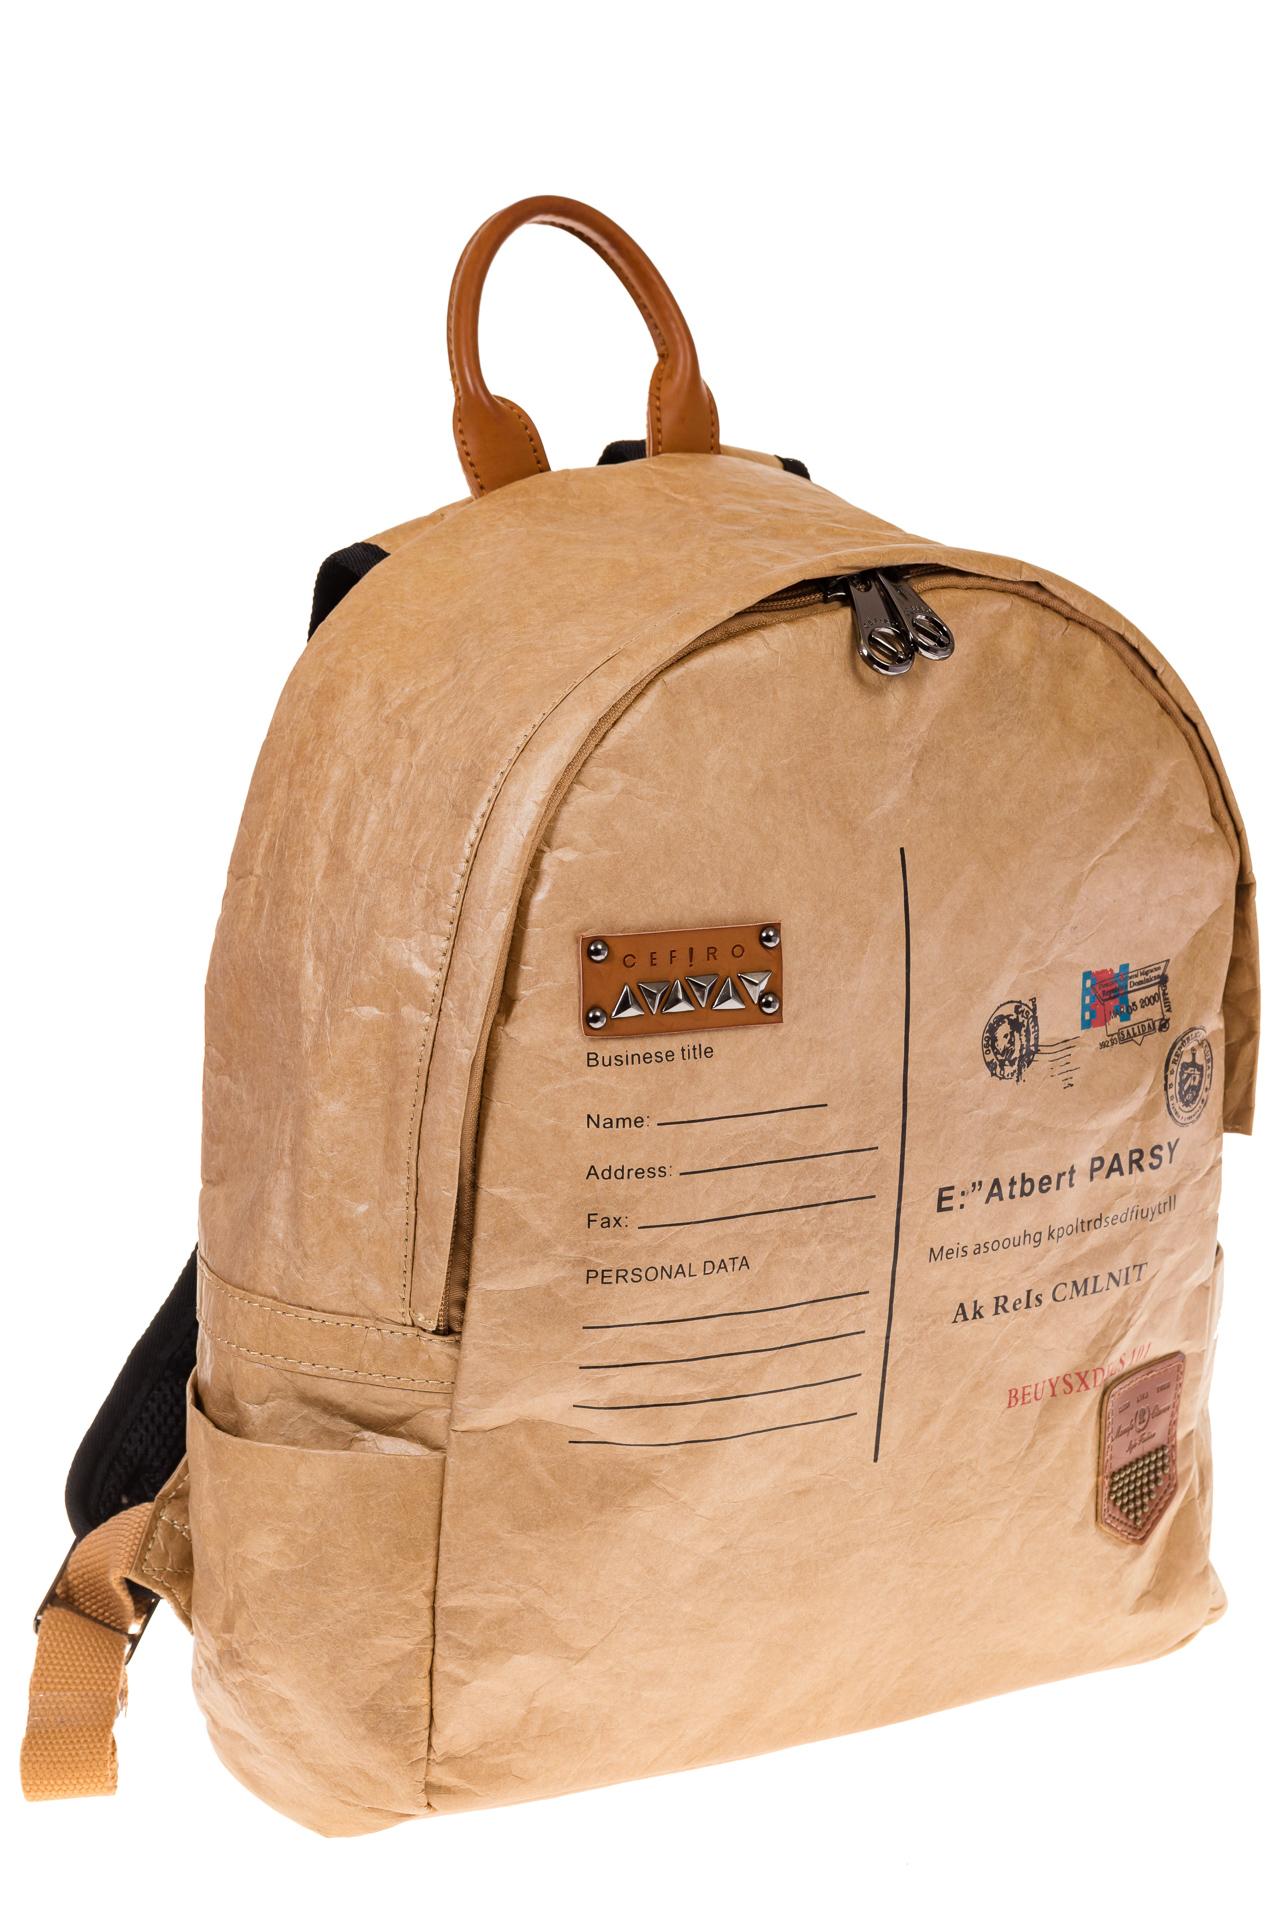 На фото бежевый женский рюкзак из материала Nano Kraft, оптом